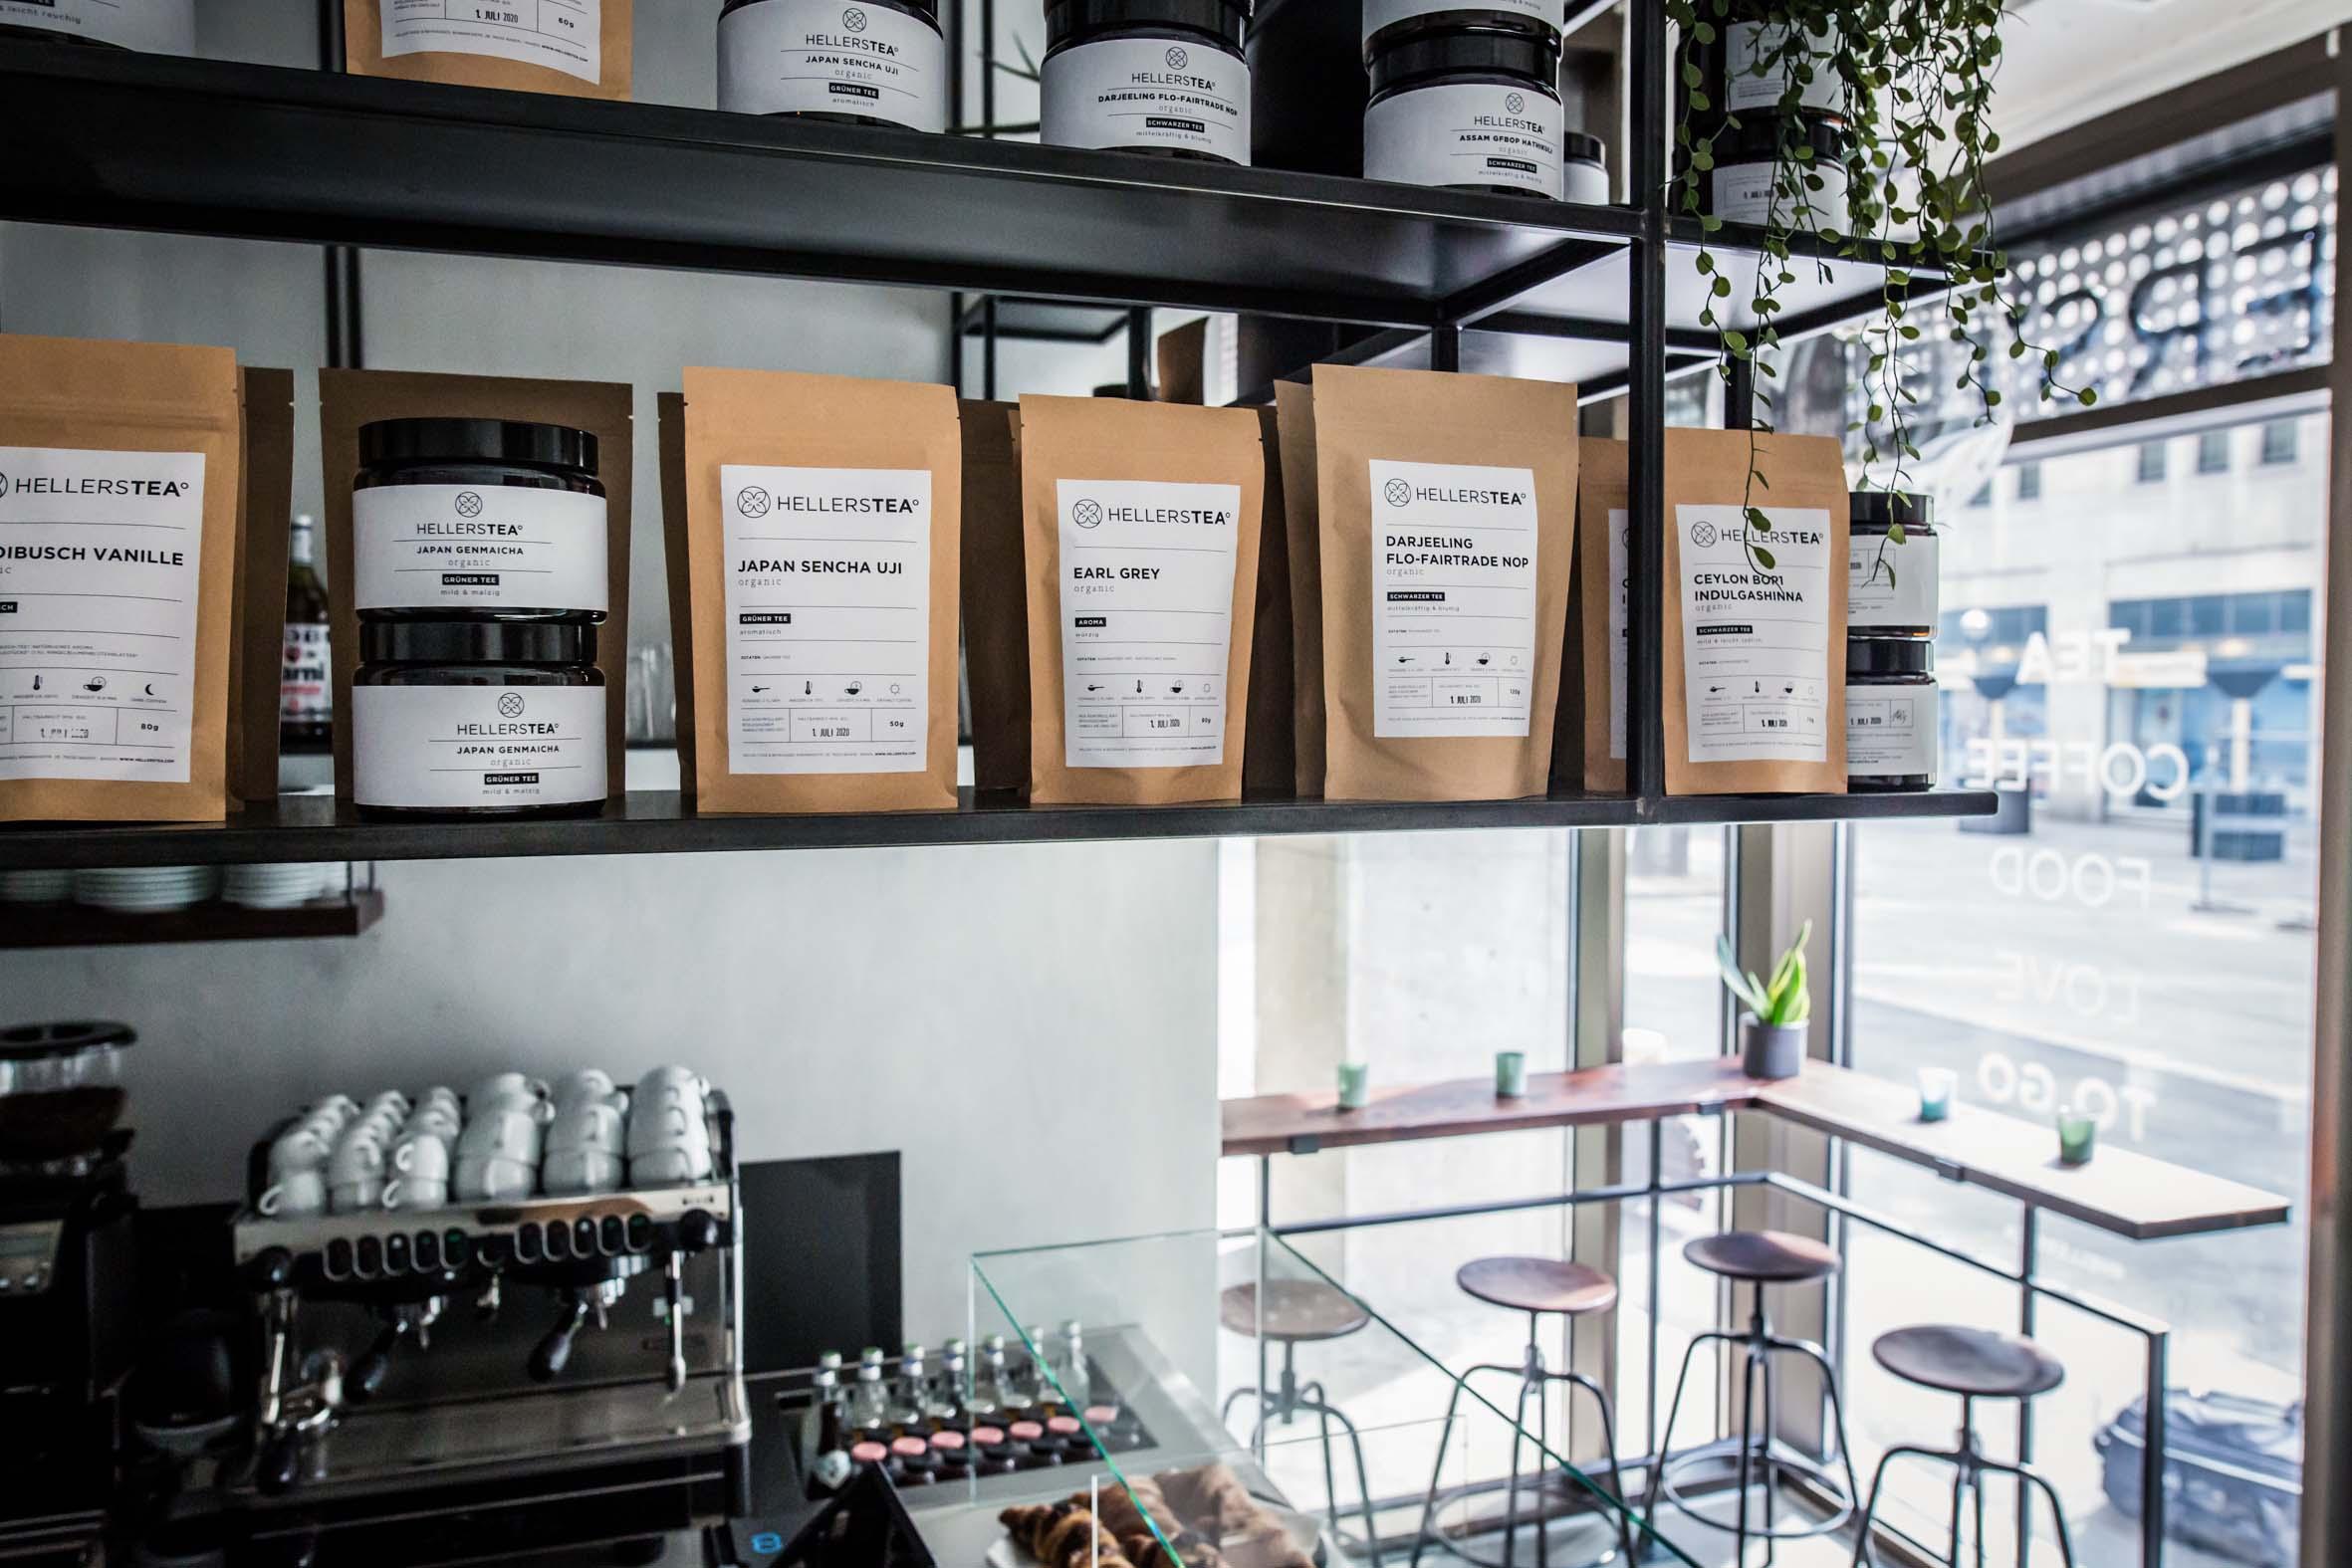 Teehängeregal Standbeutel Teesorten Hellers Tea Bar Nobla Innenarchitekt Karlsruhe